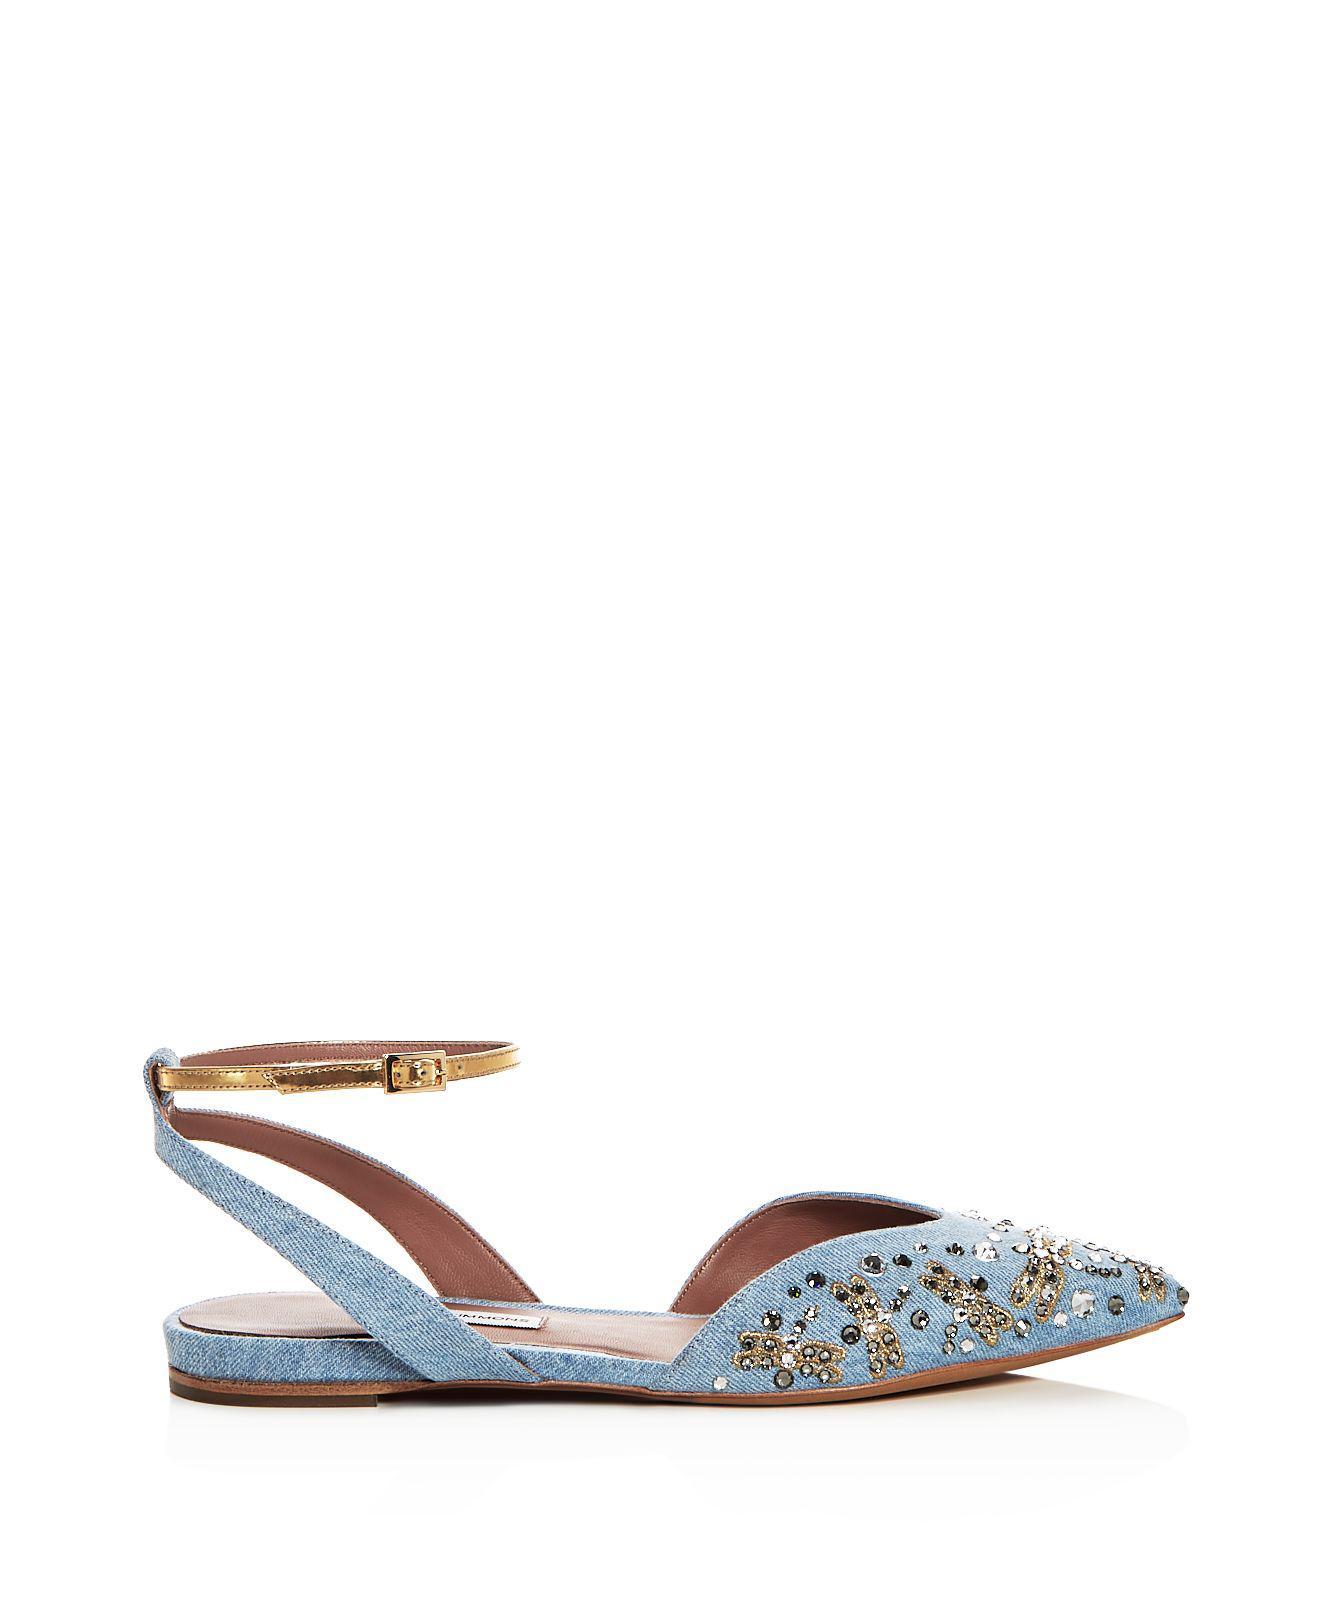 Tabitha Simmons Women's Vera Fly Spark Embellished Denim Ankle Strap Flats yVXXEK